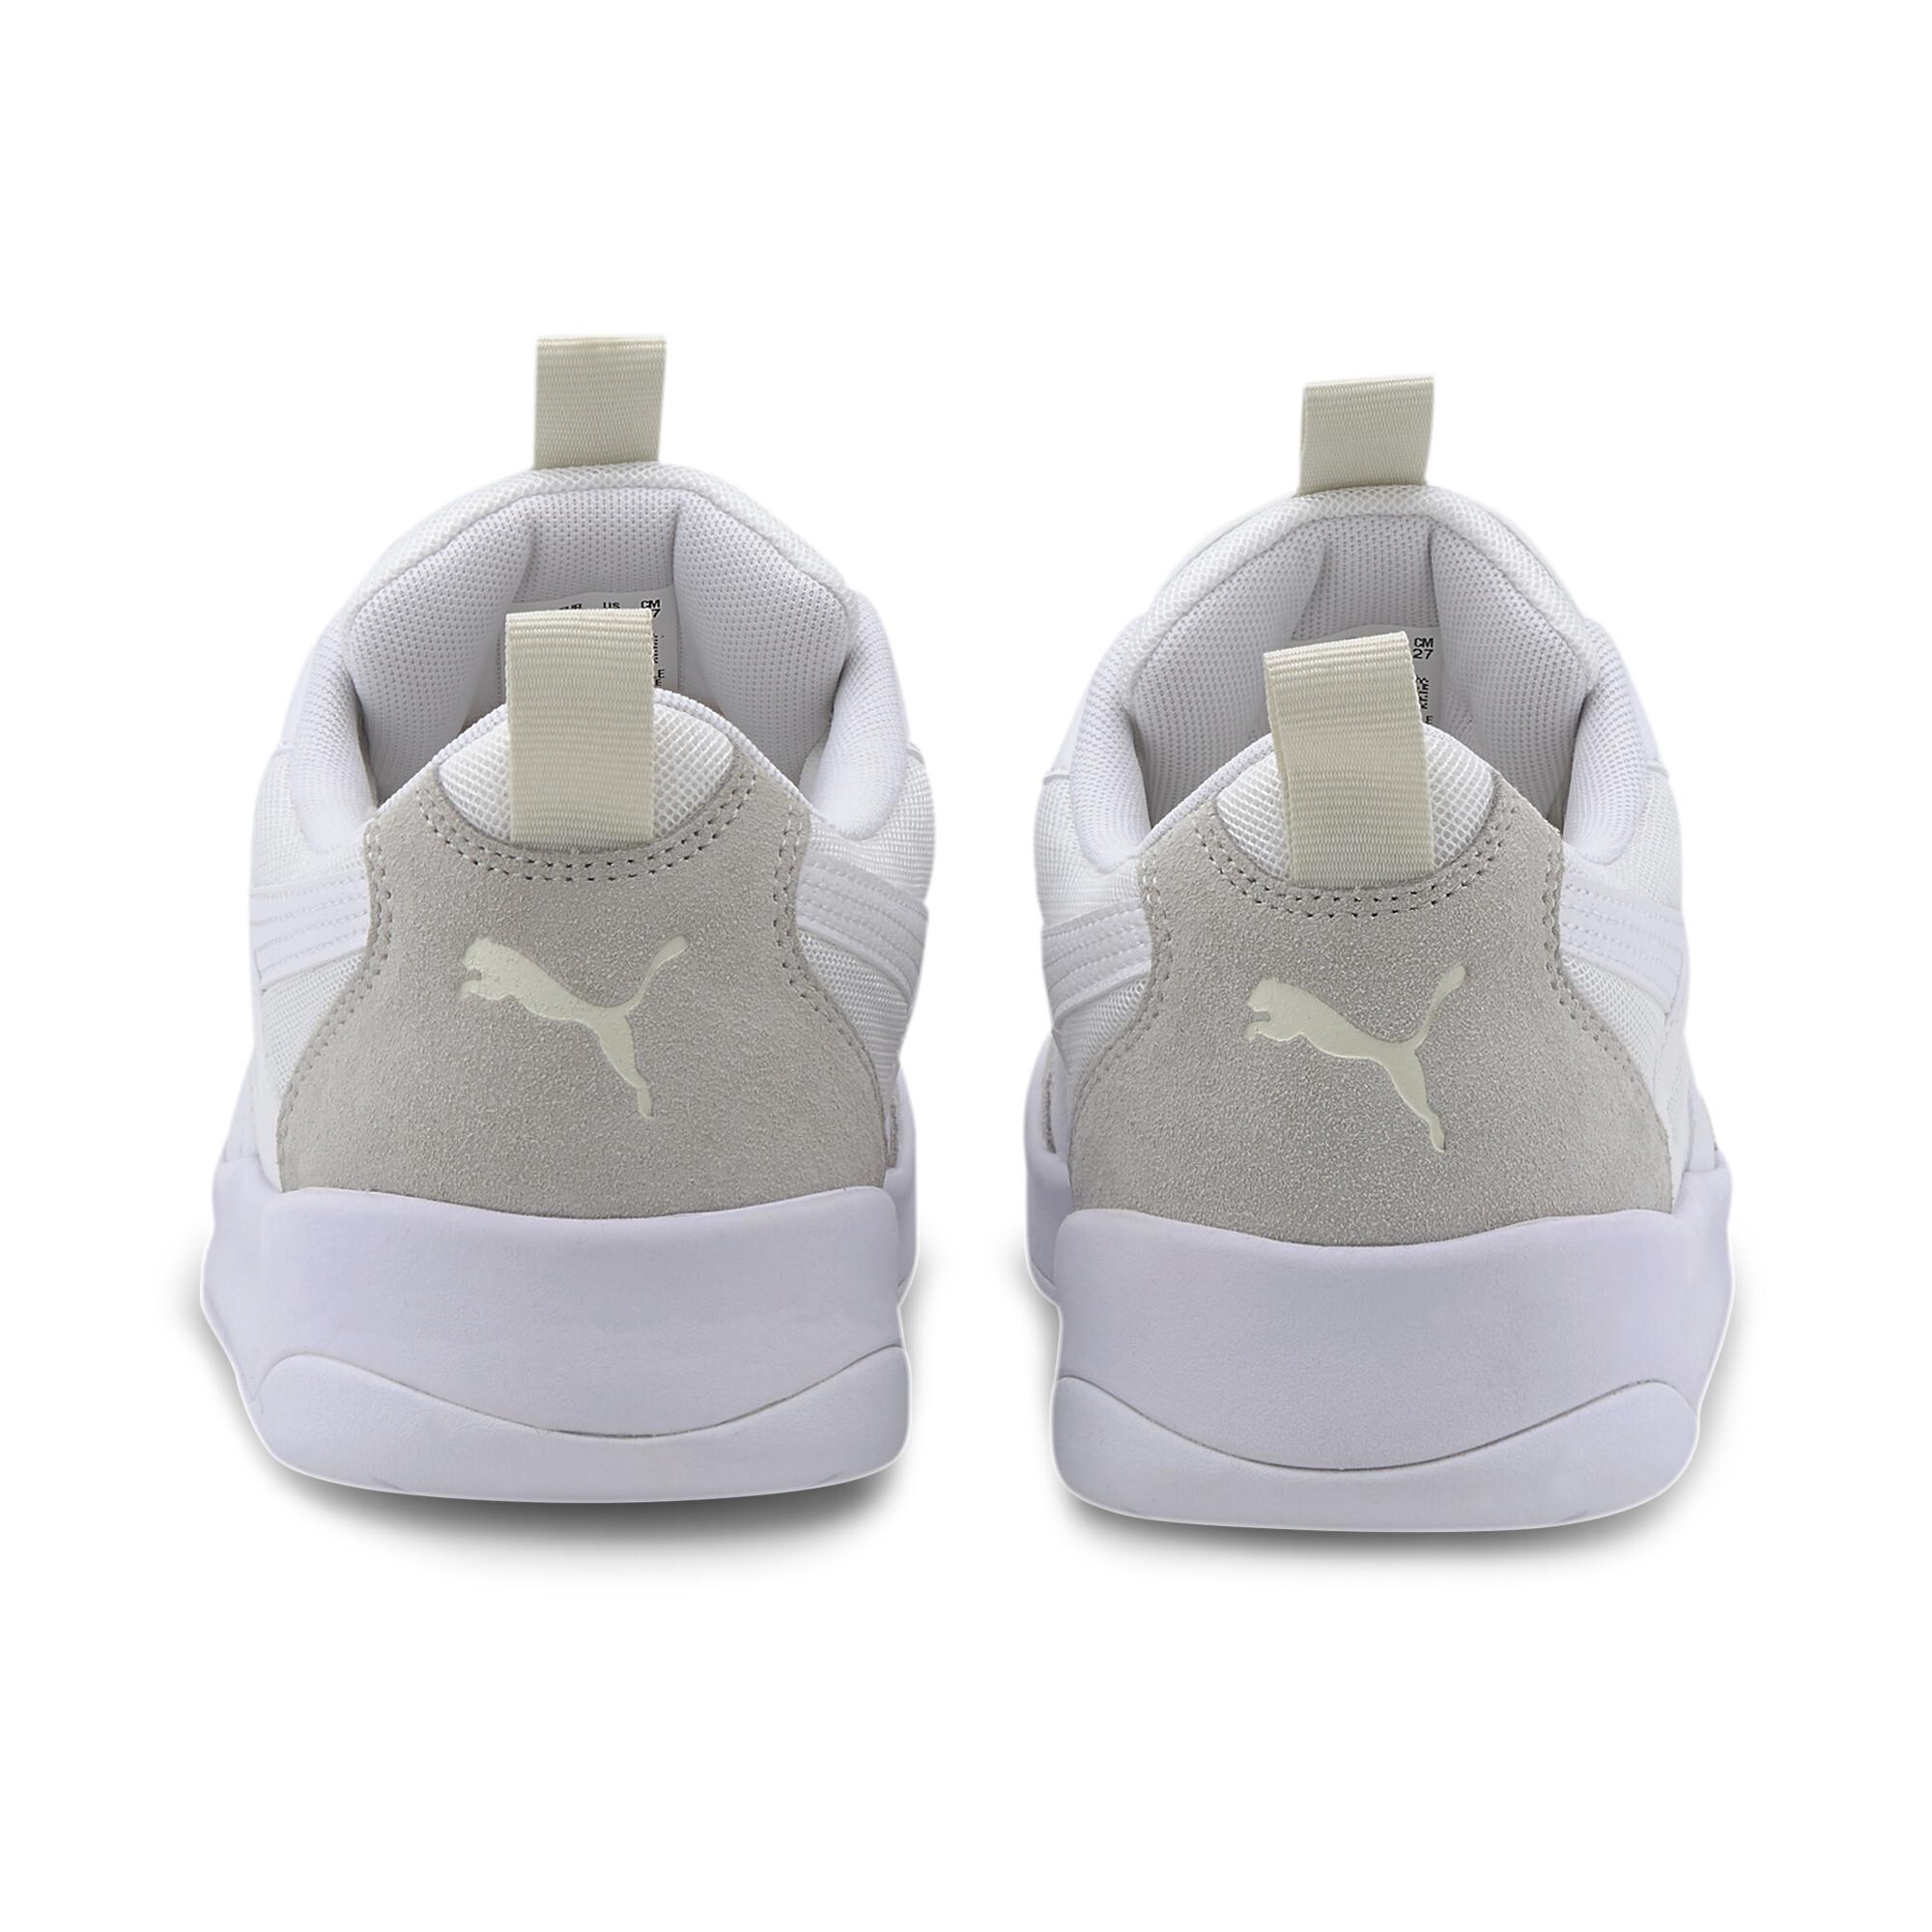 miniature 14 - Puma Men's Backcourt Sneakers